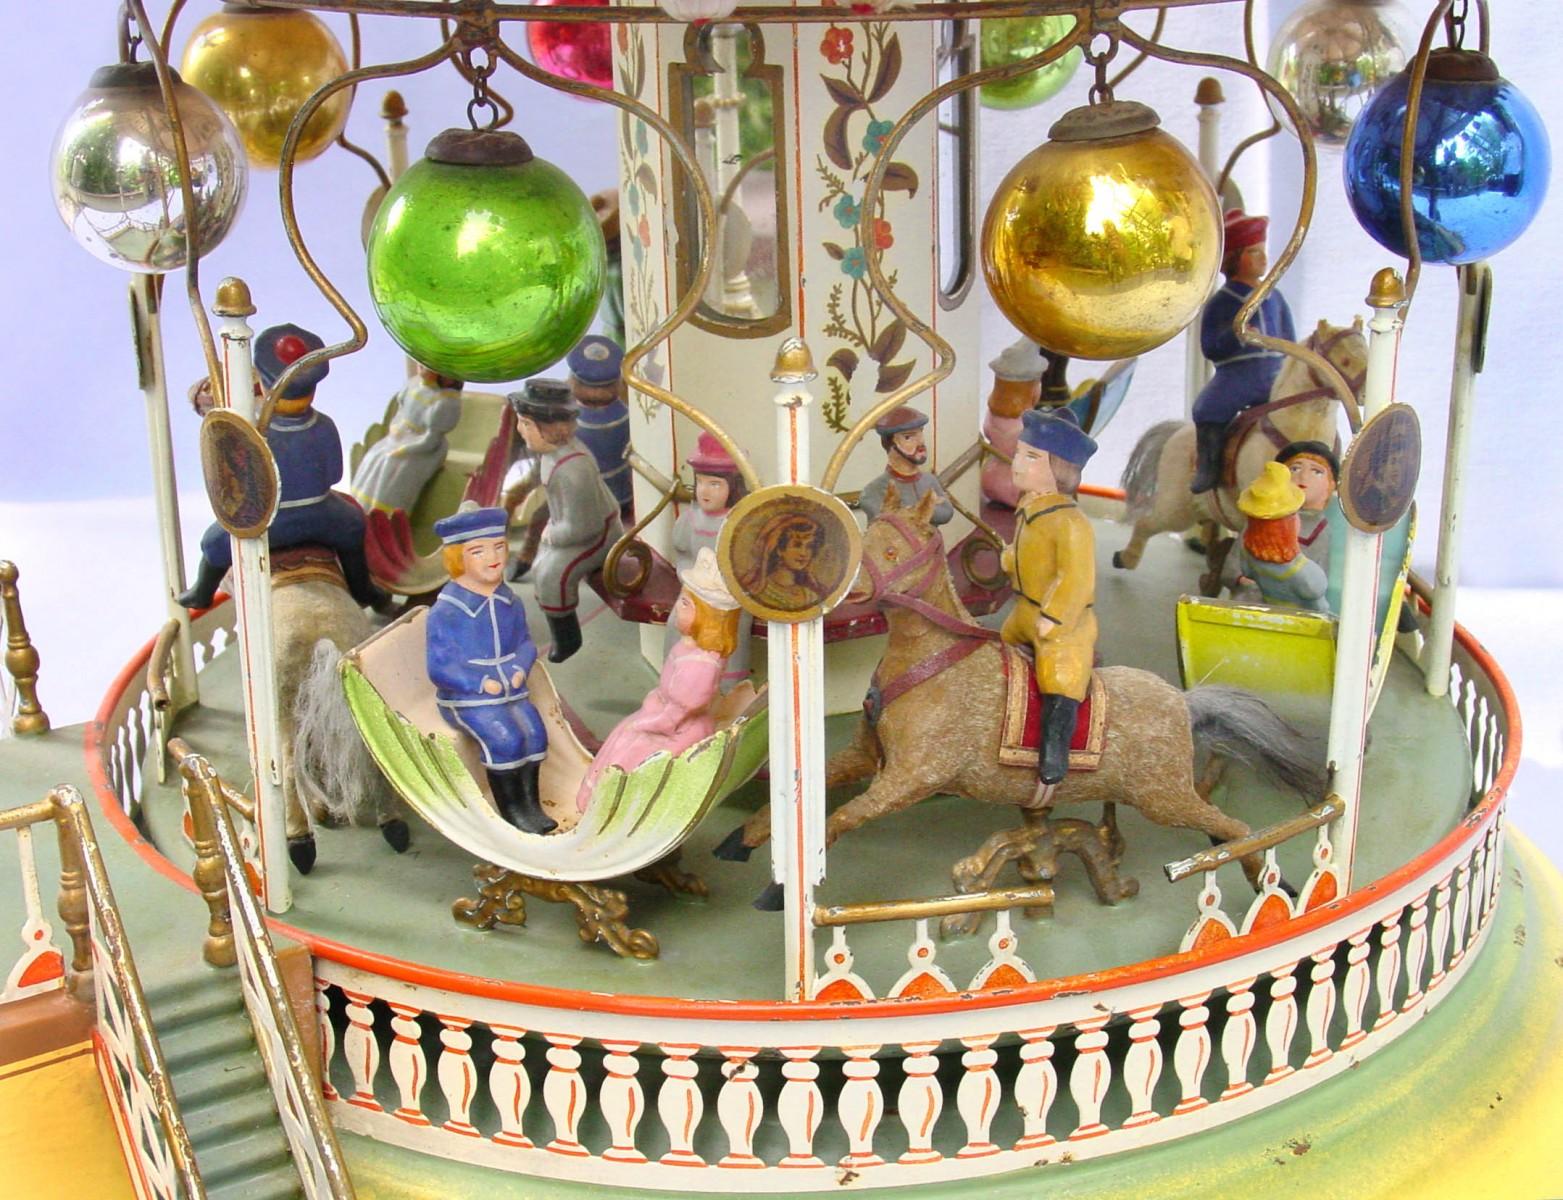 Pressebild-Theurer-Karussell-farbig